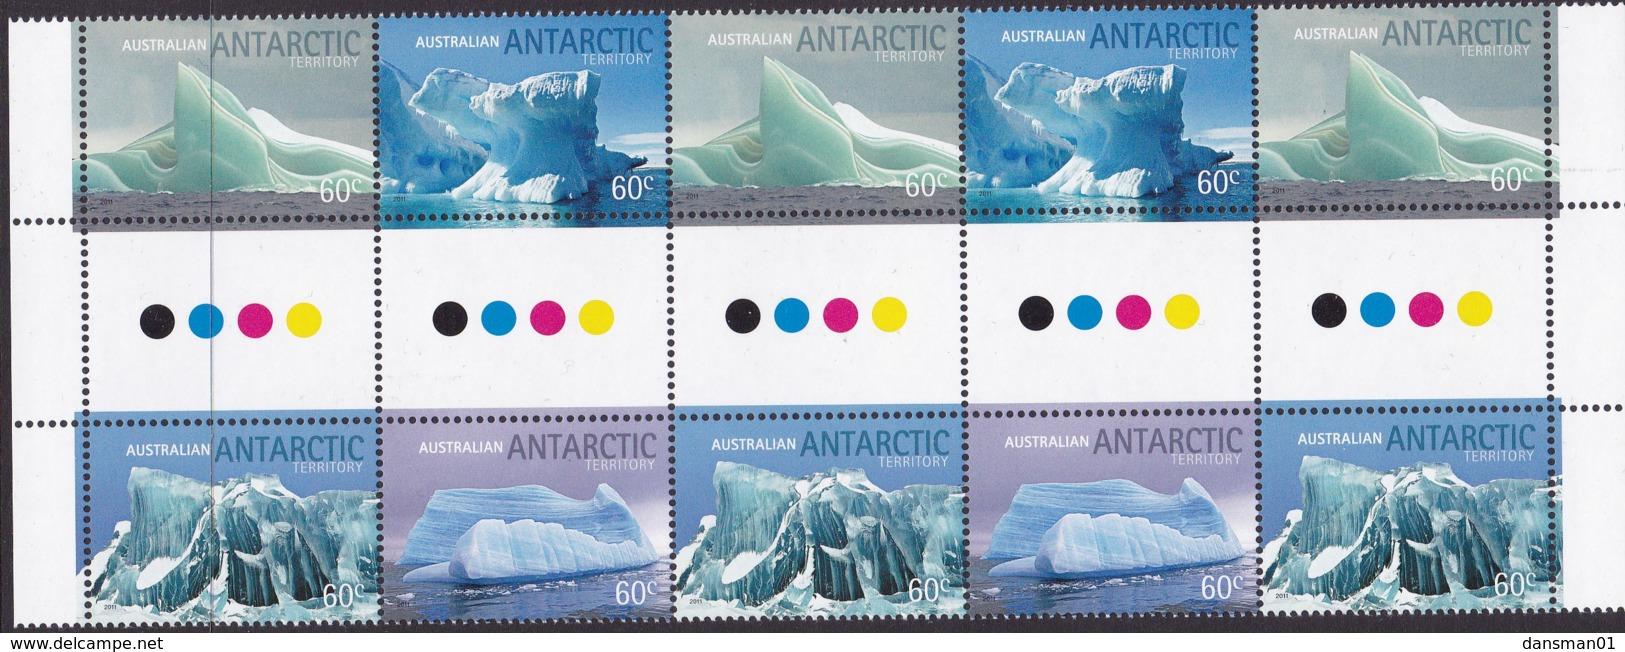 Australia Antartic Territory 2011 'Icebergs'  Mint Never Hinged Gutter - Unused Stamps